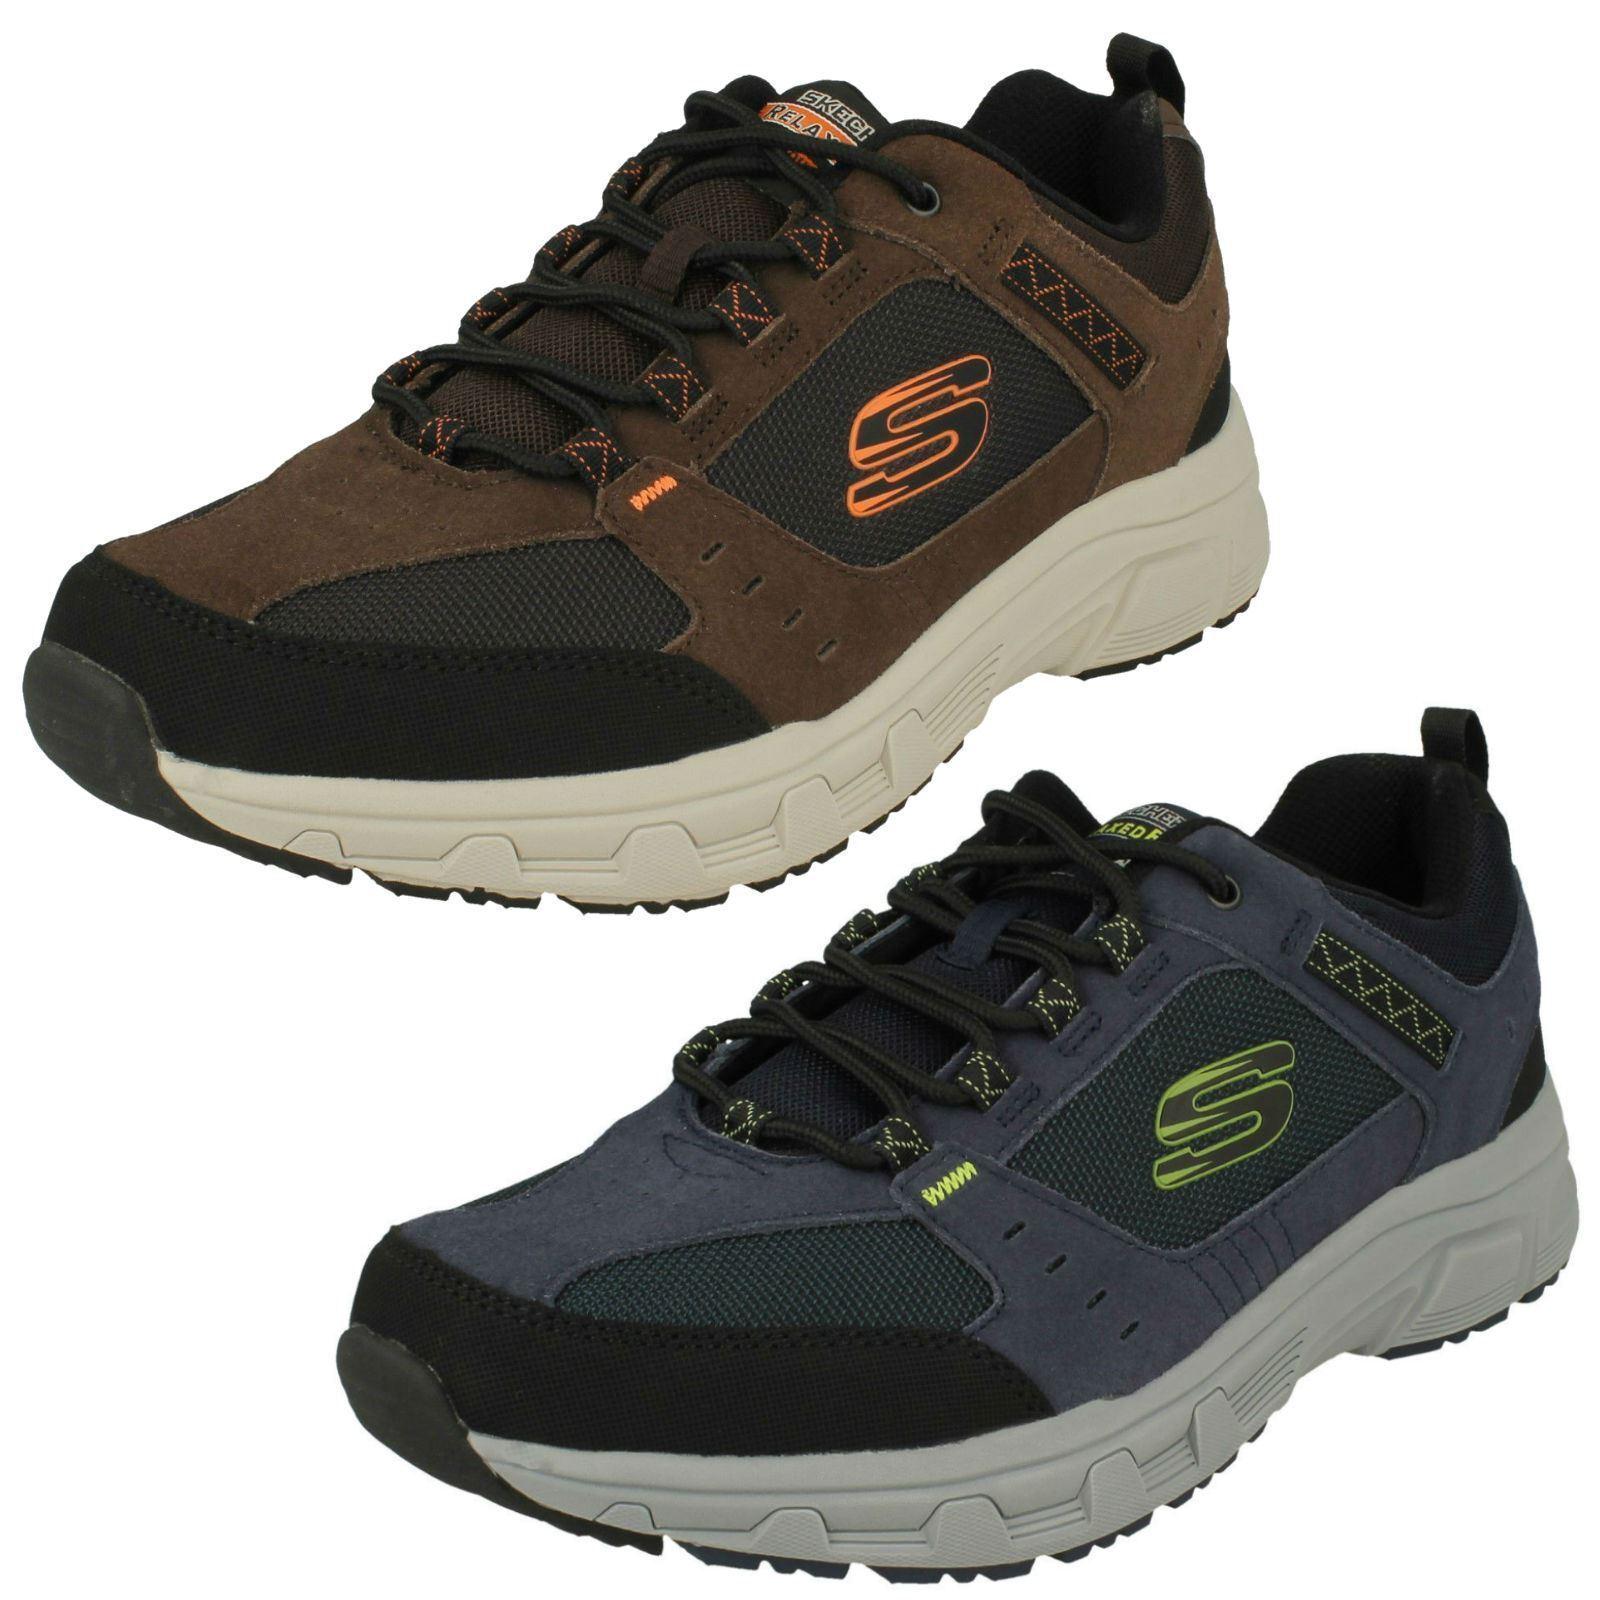 Hombre Skechers Exterior Roble Cañón 51893 Zapatillas con Cordones